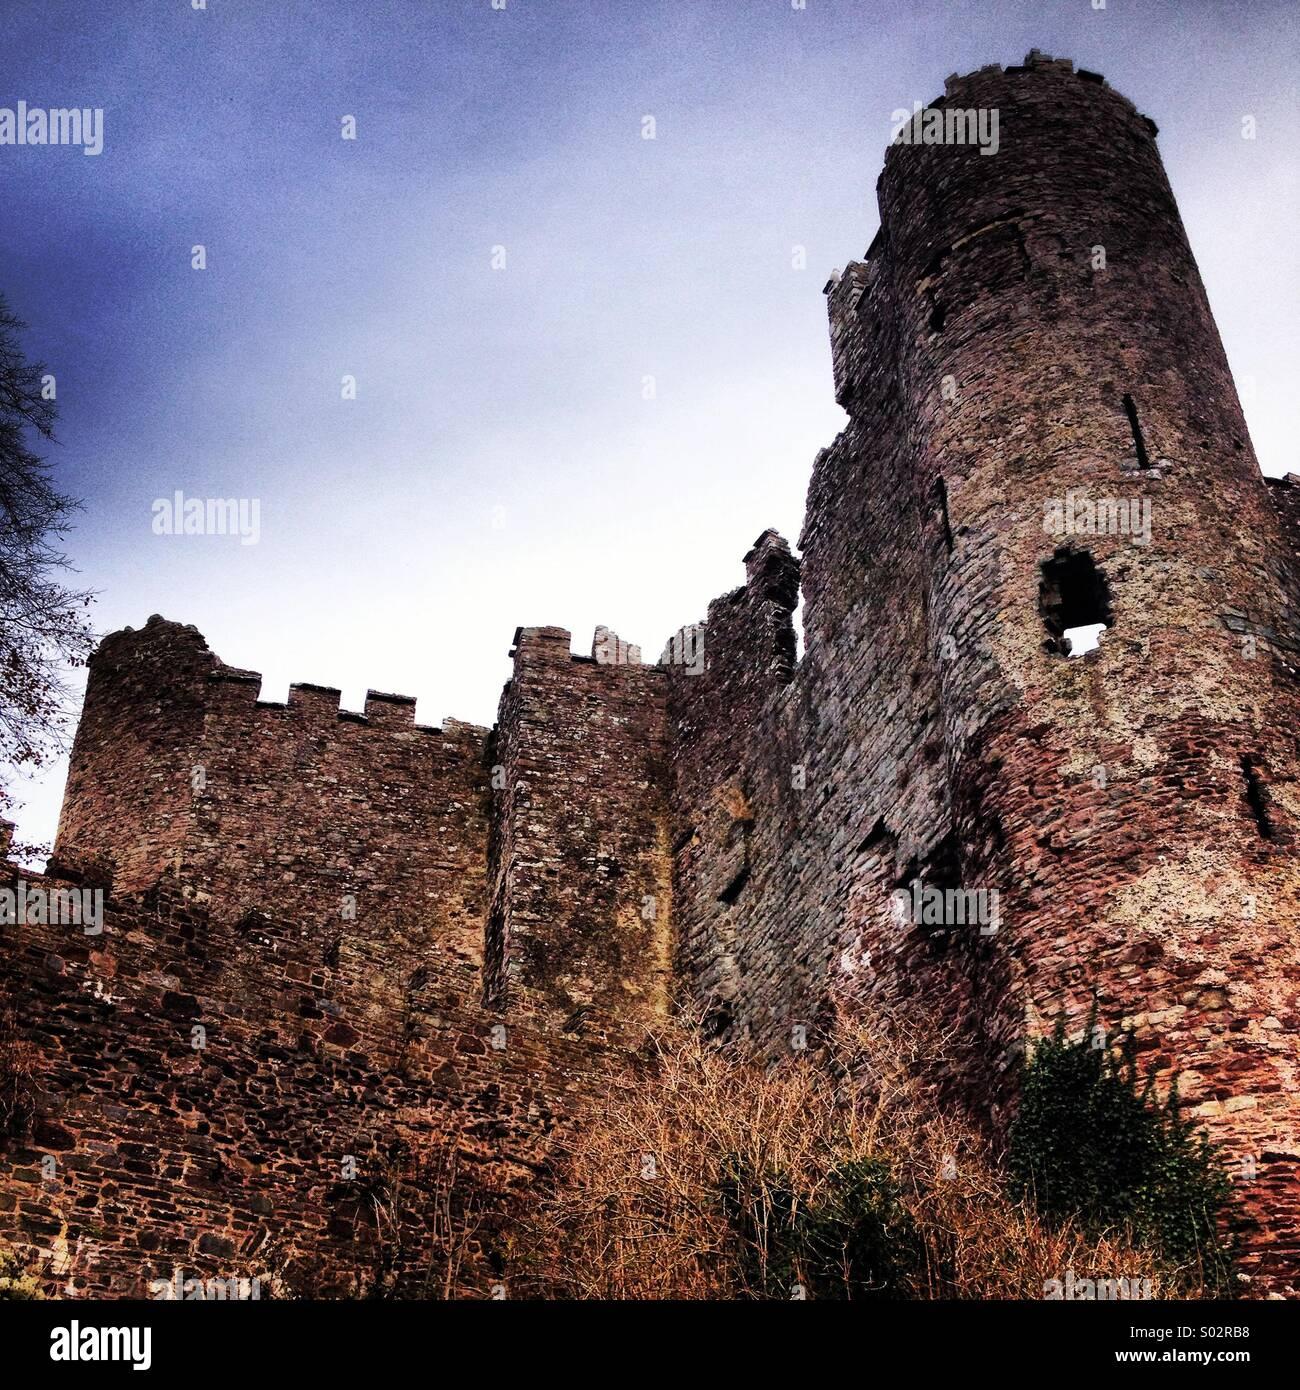 Haunted castle. - Stock Image